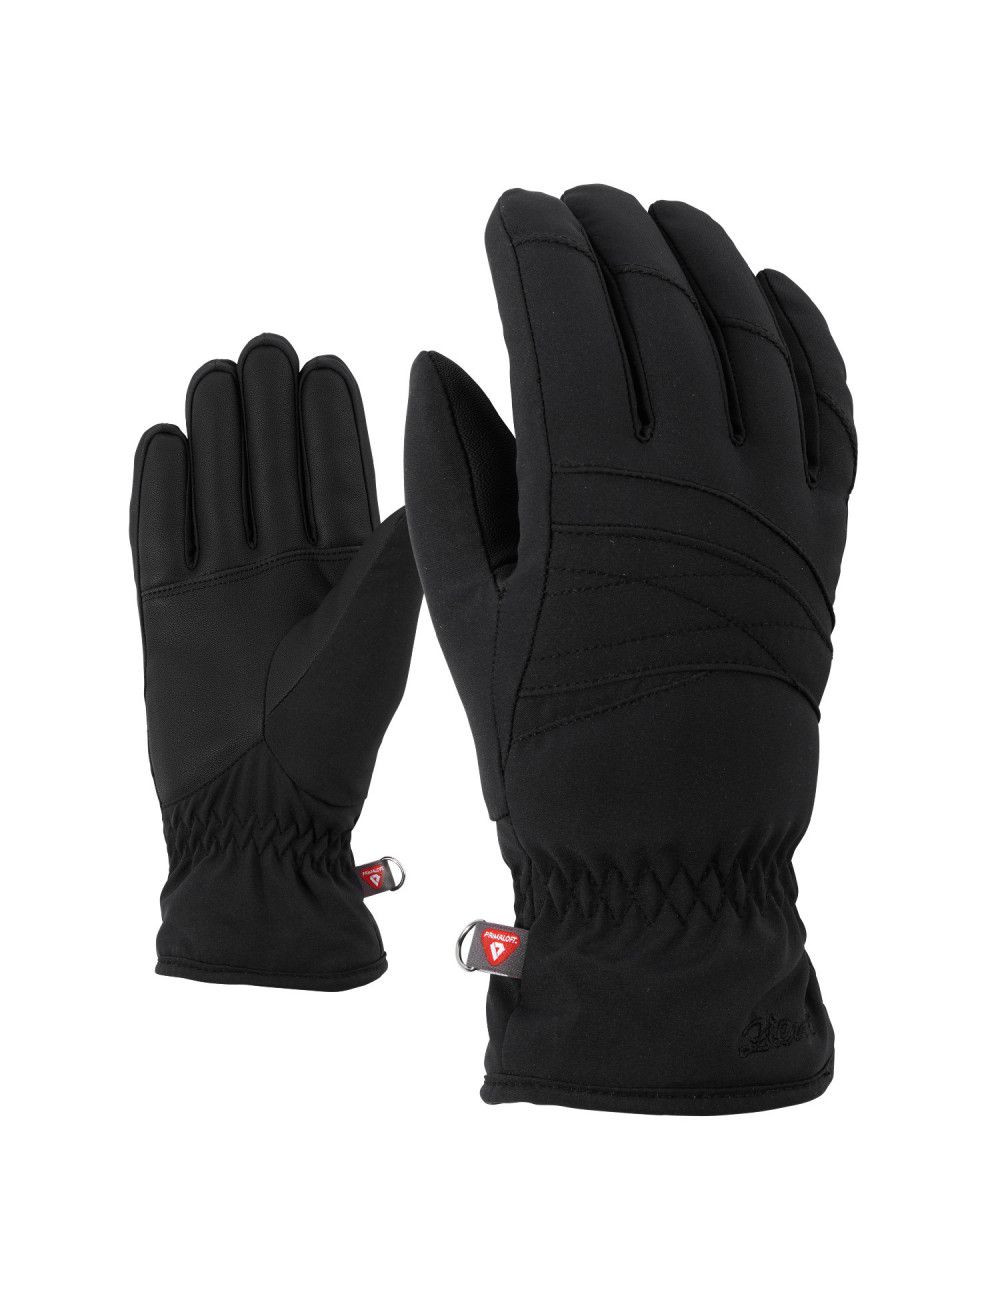 Rękawice narciarskie Ziener Kampen Primaloft